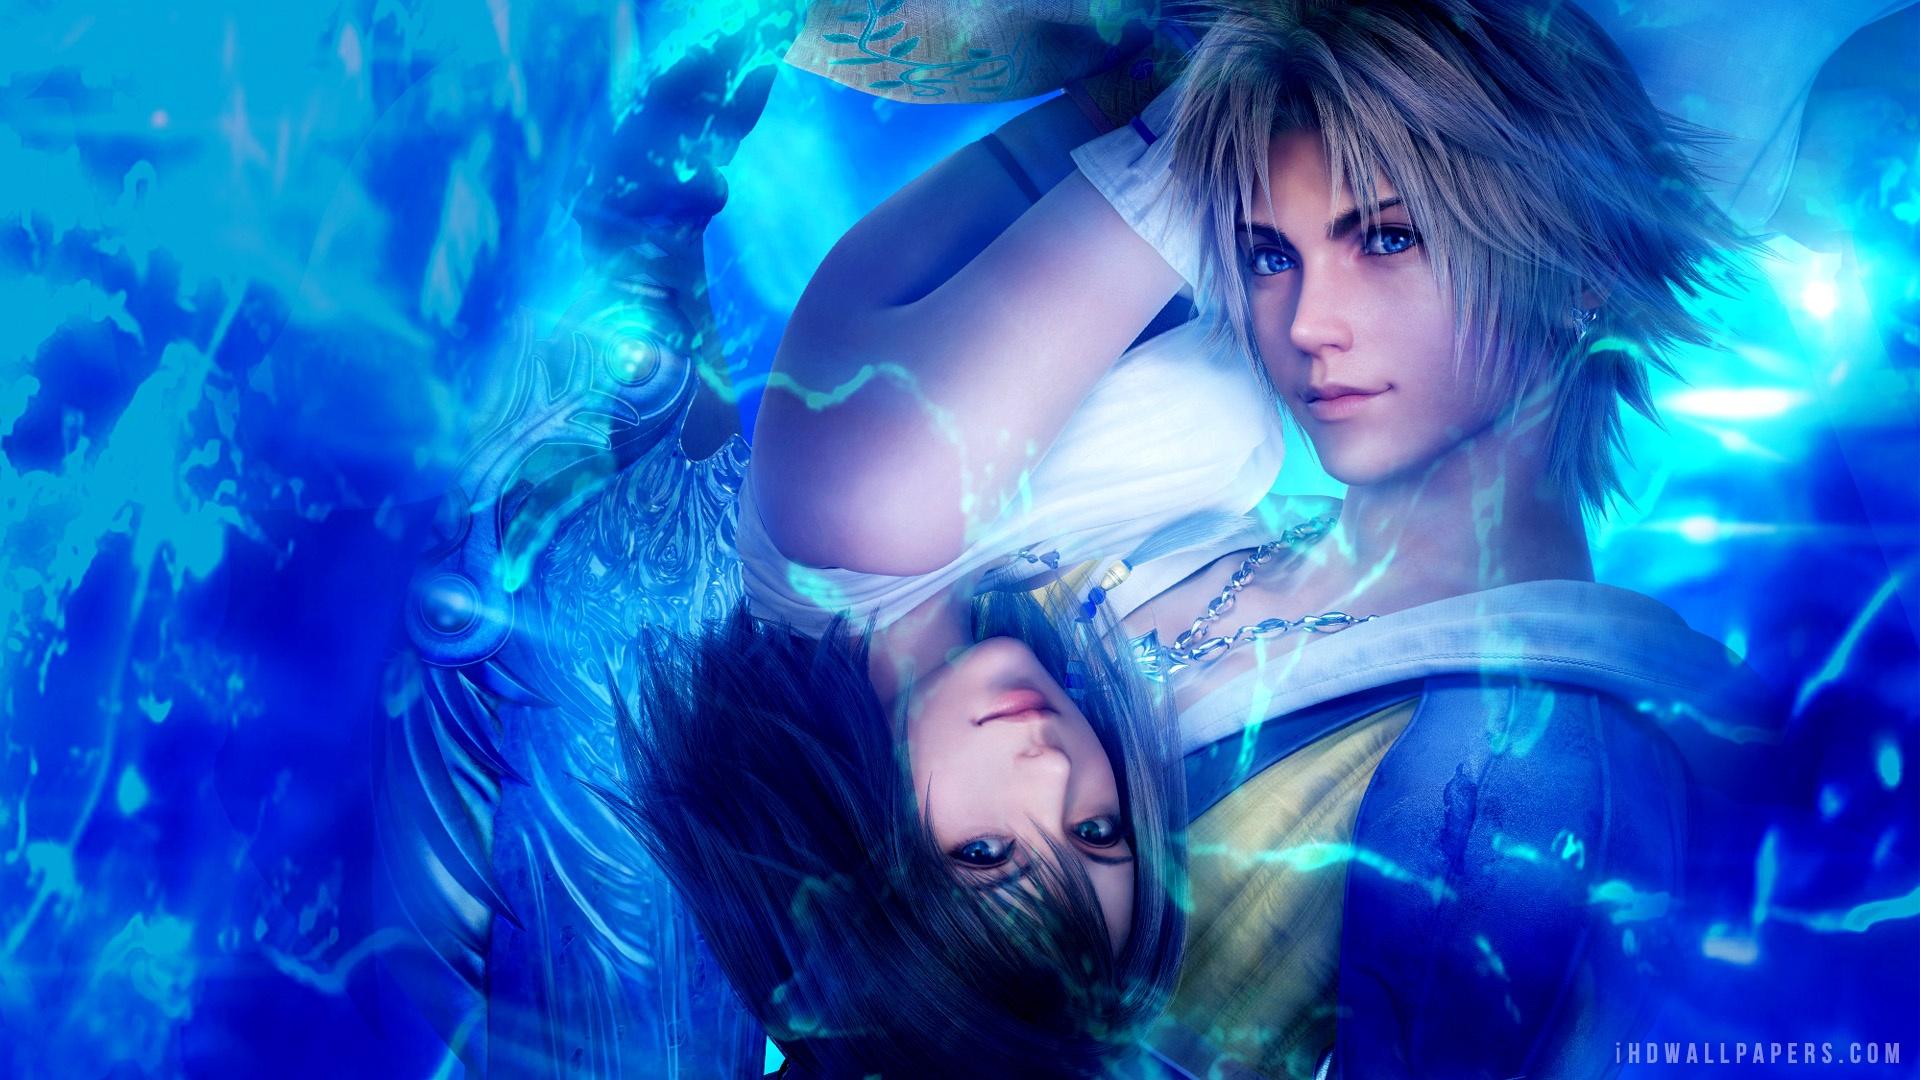 Yuna Tidus Final Fantasy X HD Wallpaper   iHD Wallpapers 1920x1080